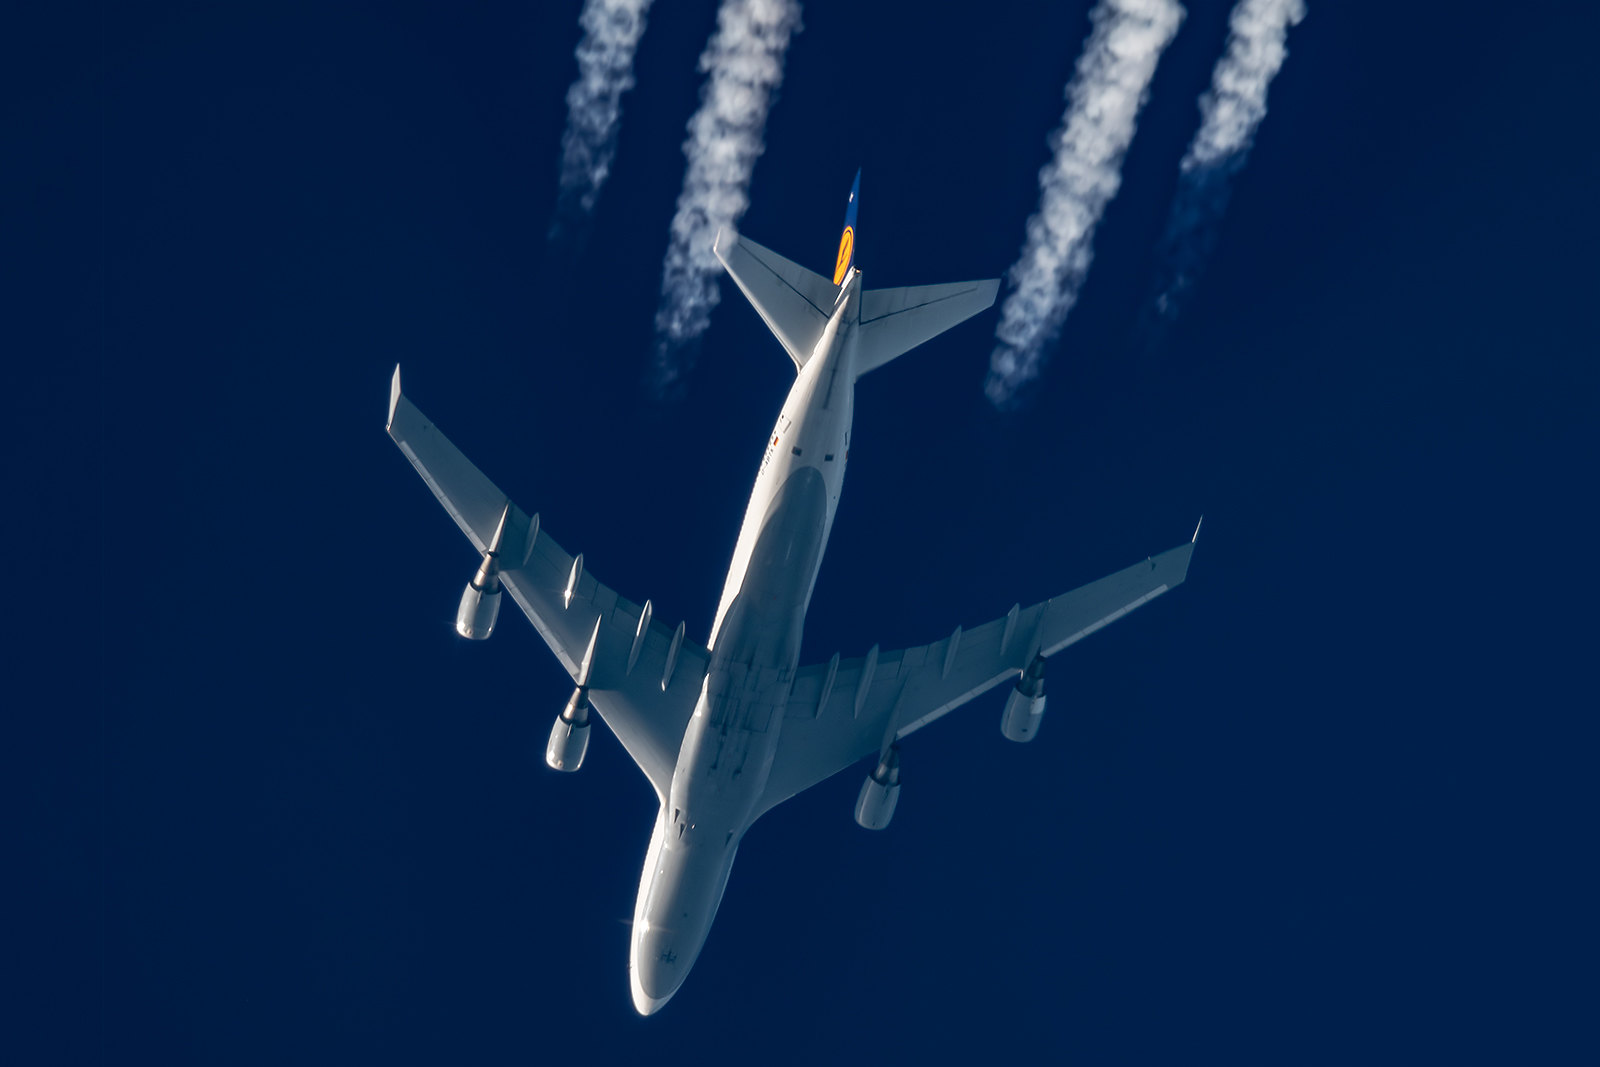 Contrail spotting September 2008 - Aviation24.be